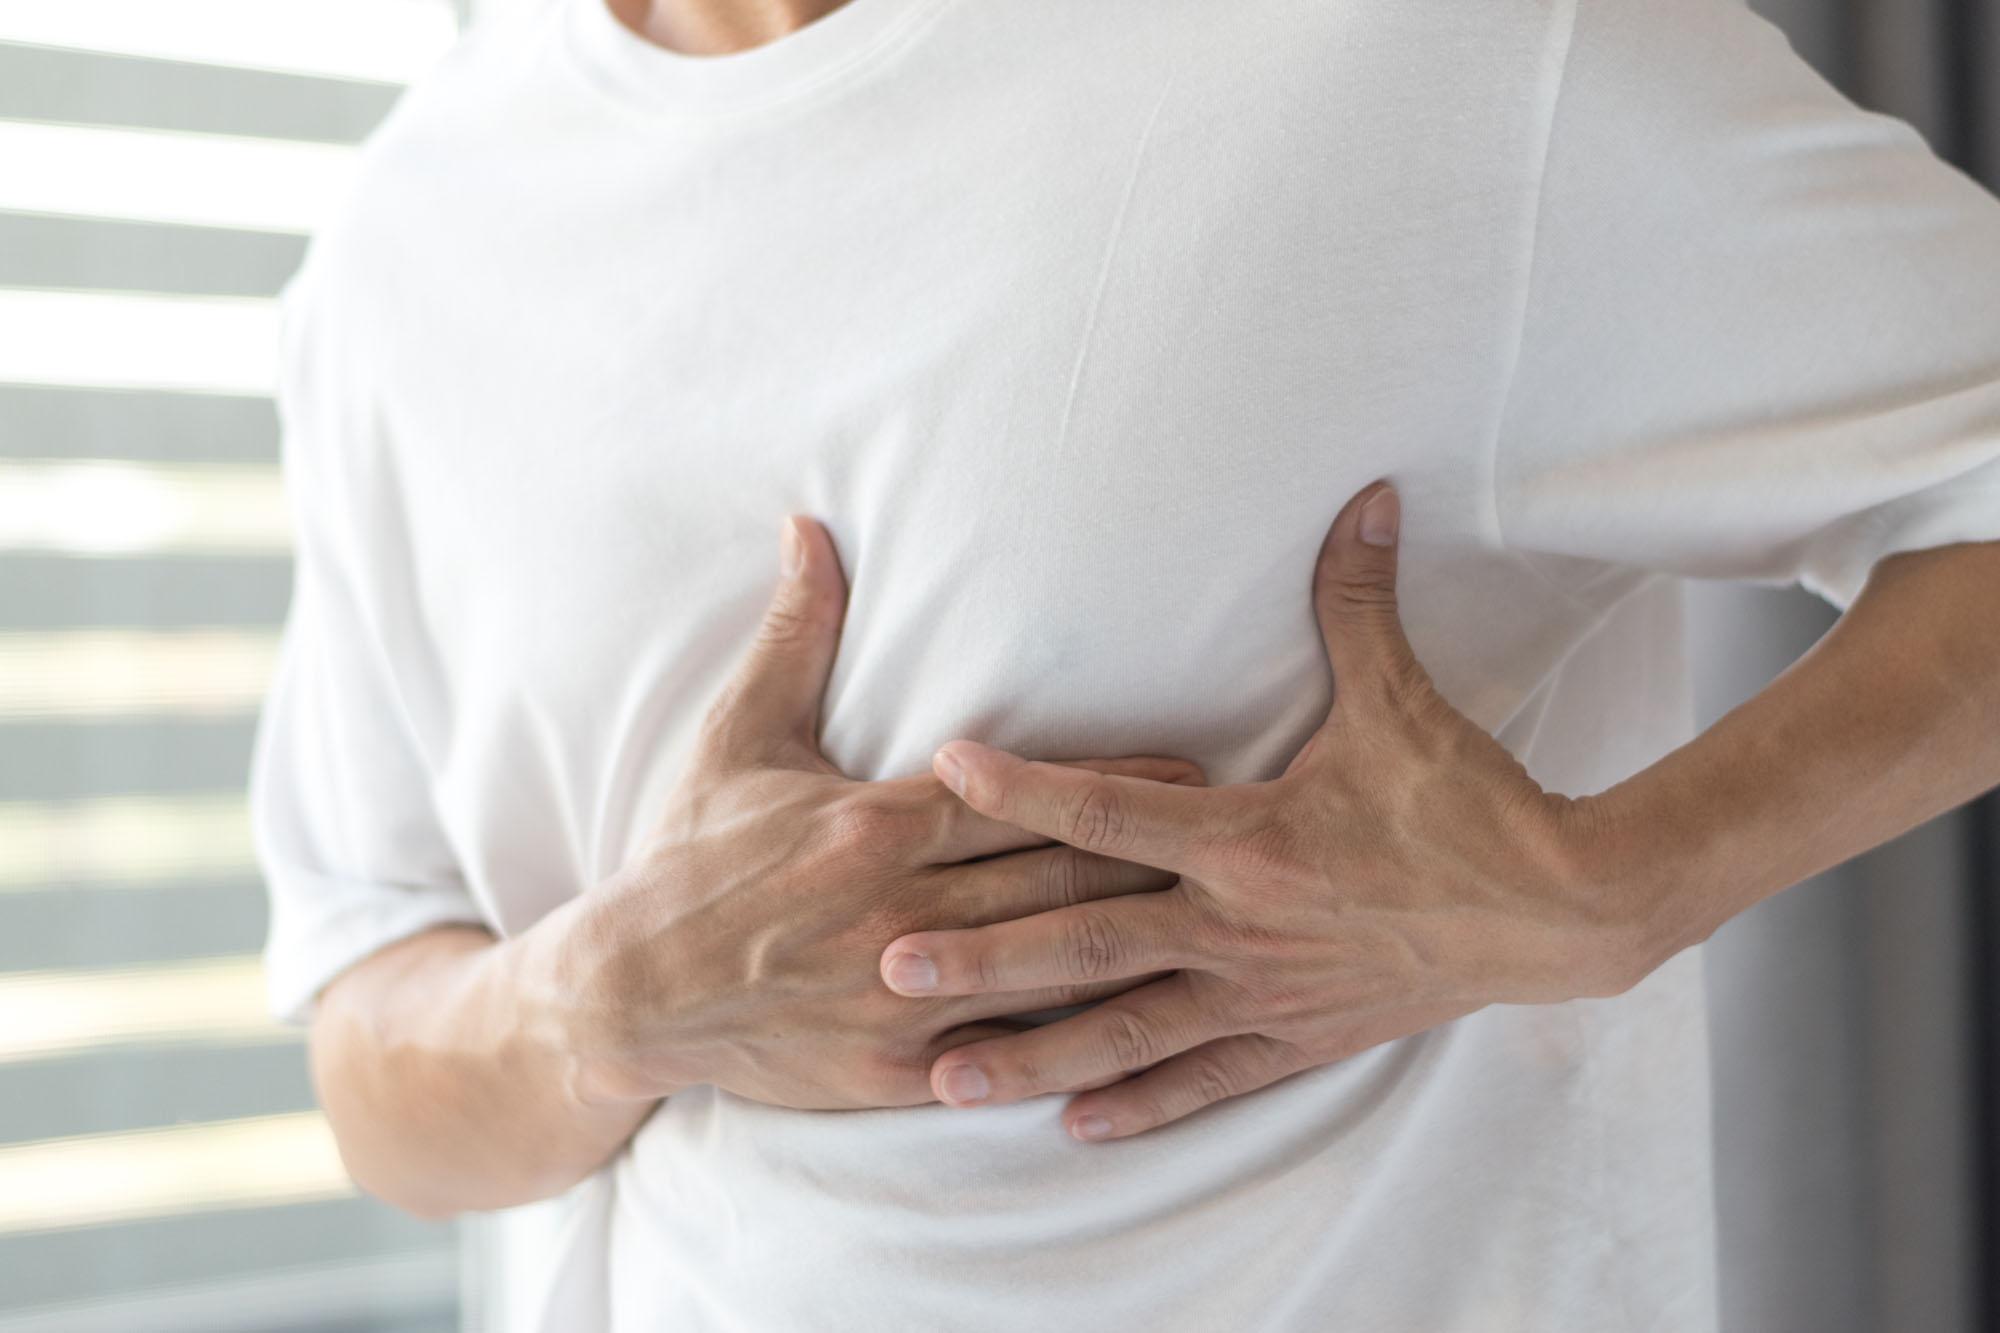 Kleine brustkrebs brust sehr Brustkrebs: Symptome